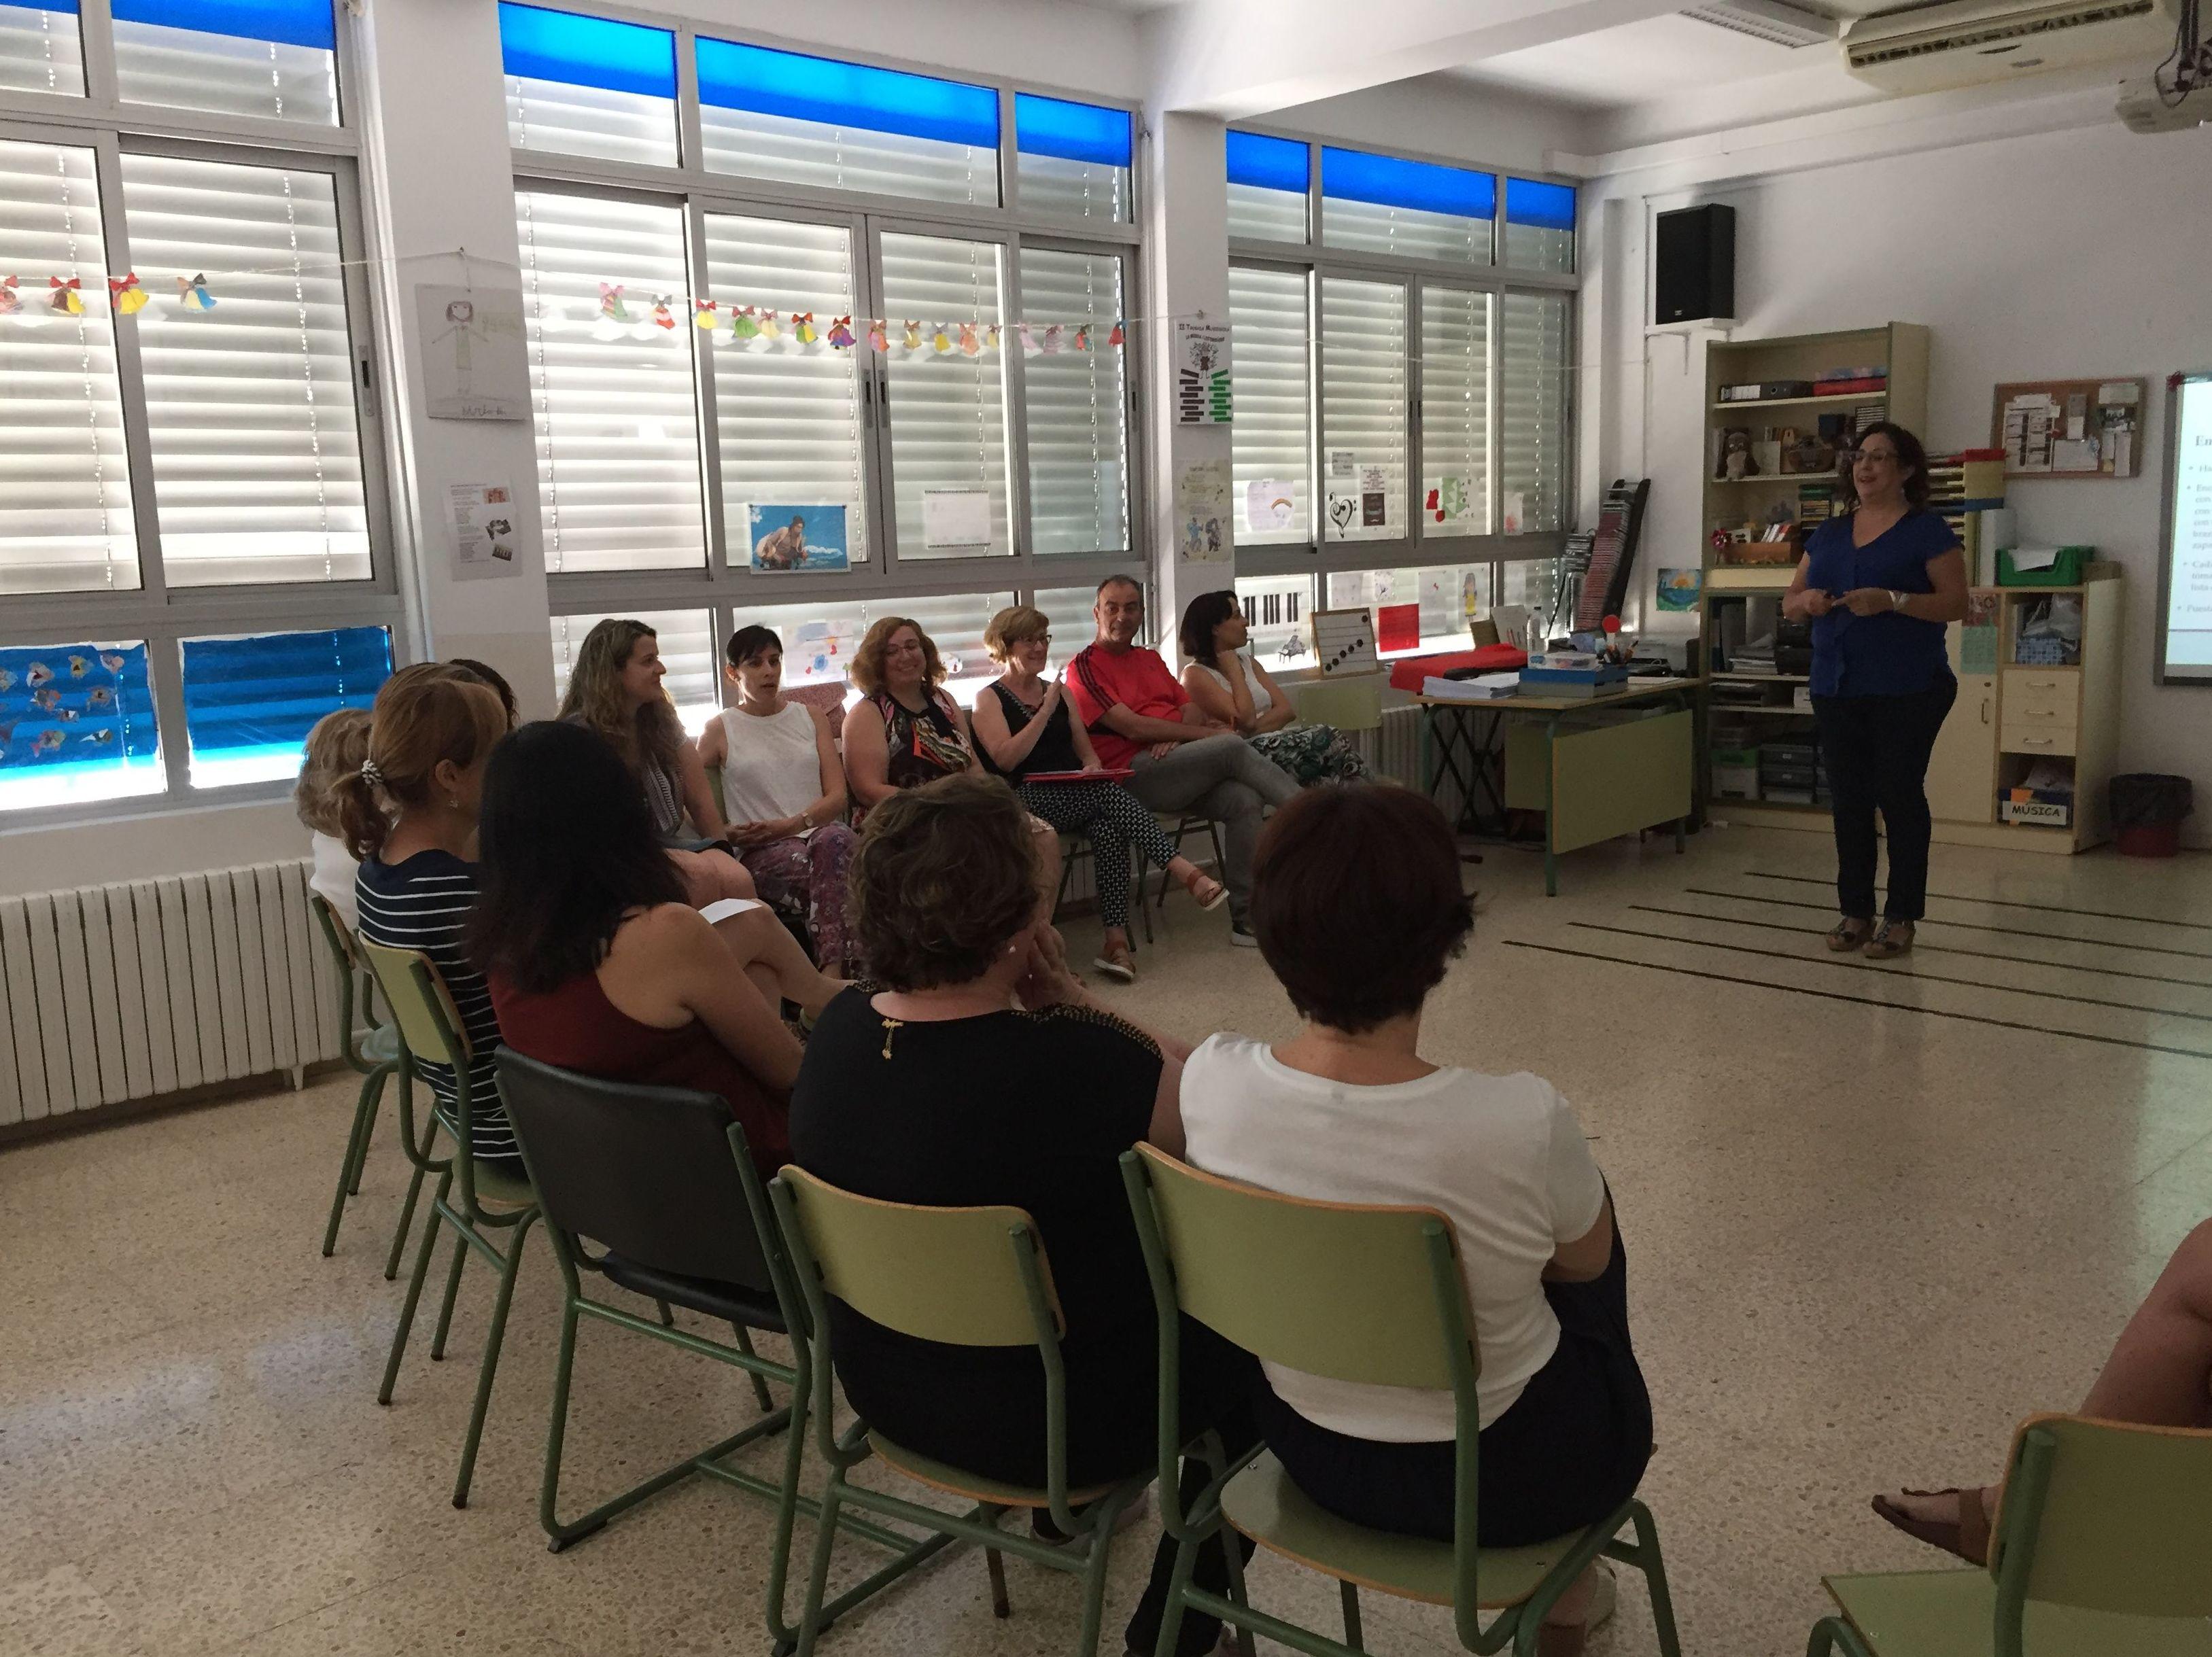 taller Joan Martorell I.E. Fundamento junio 2017